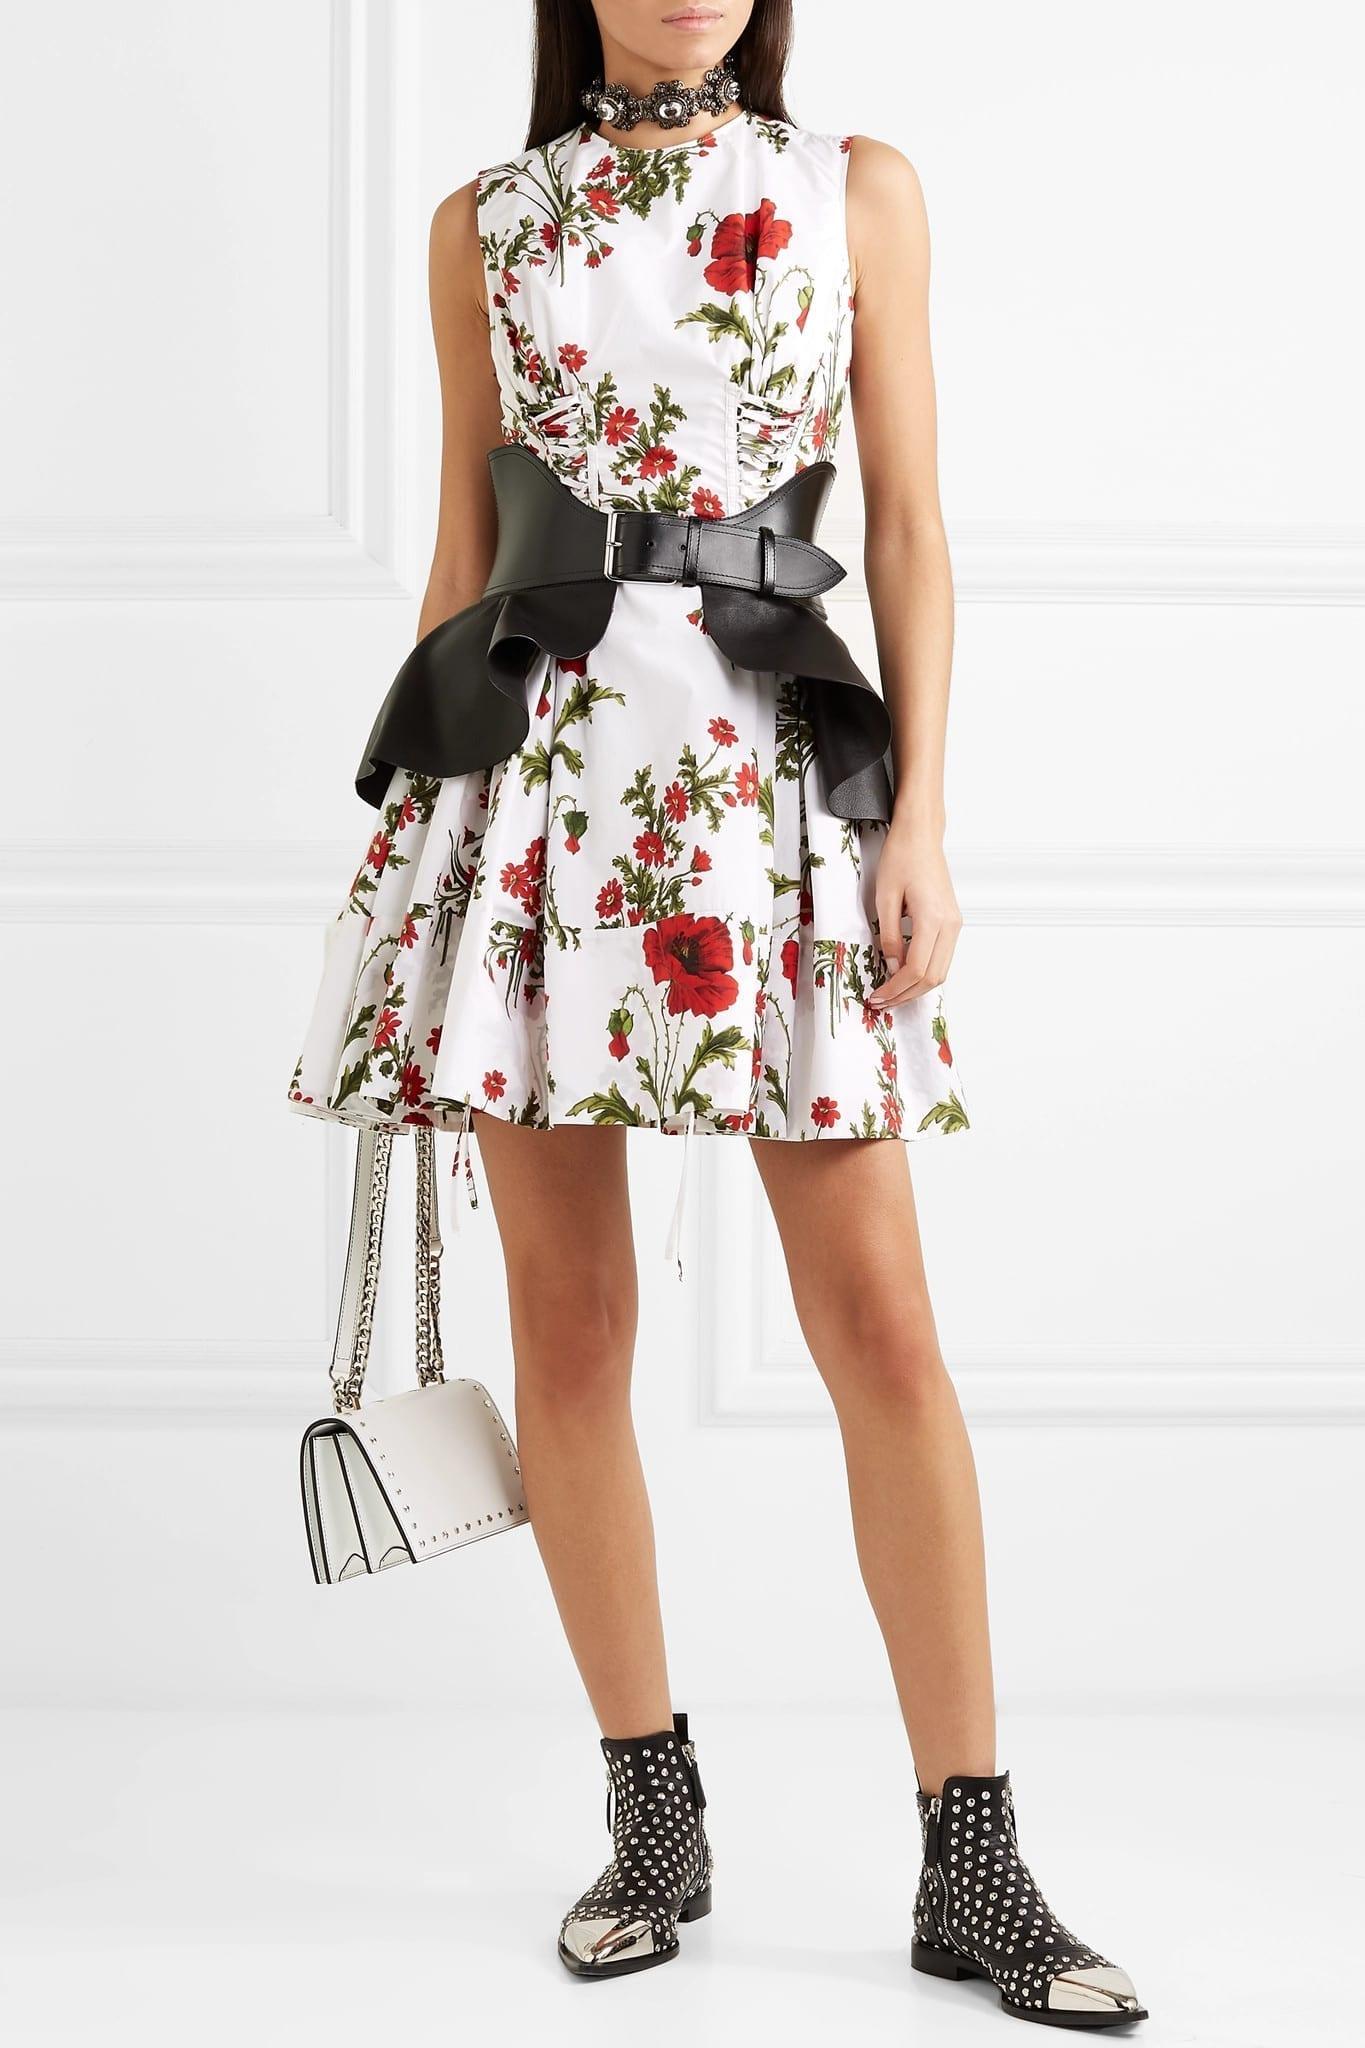 ALEXANDER MCQUEEN Lace-up Floral-Print Cotton-Poplin Mini White Dress